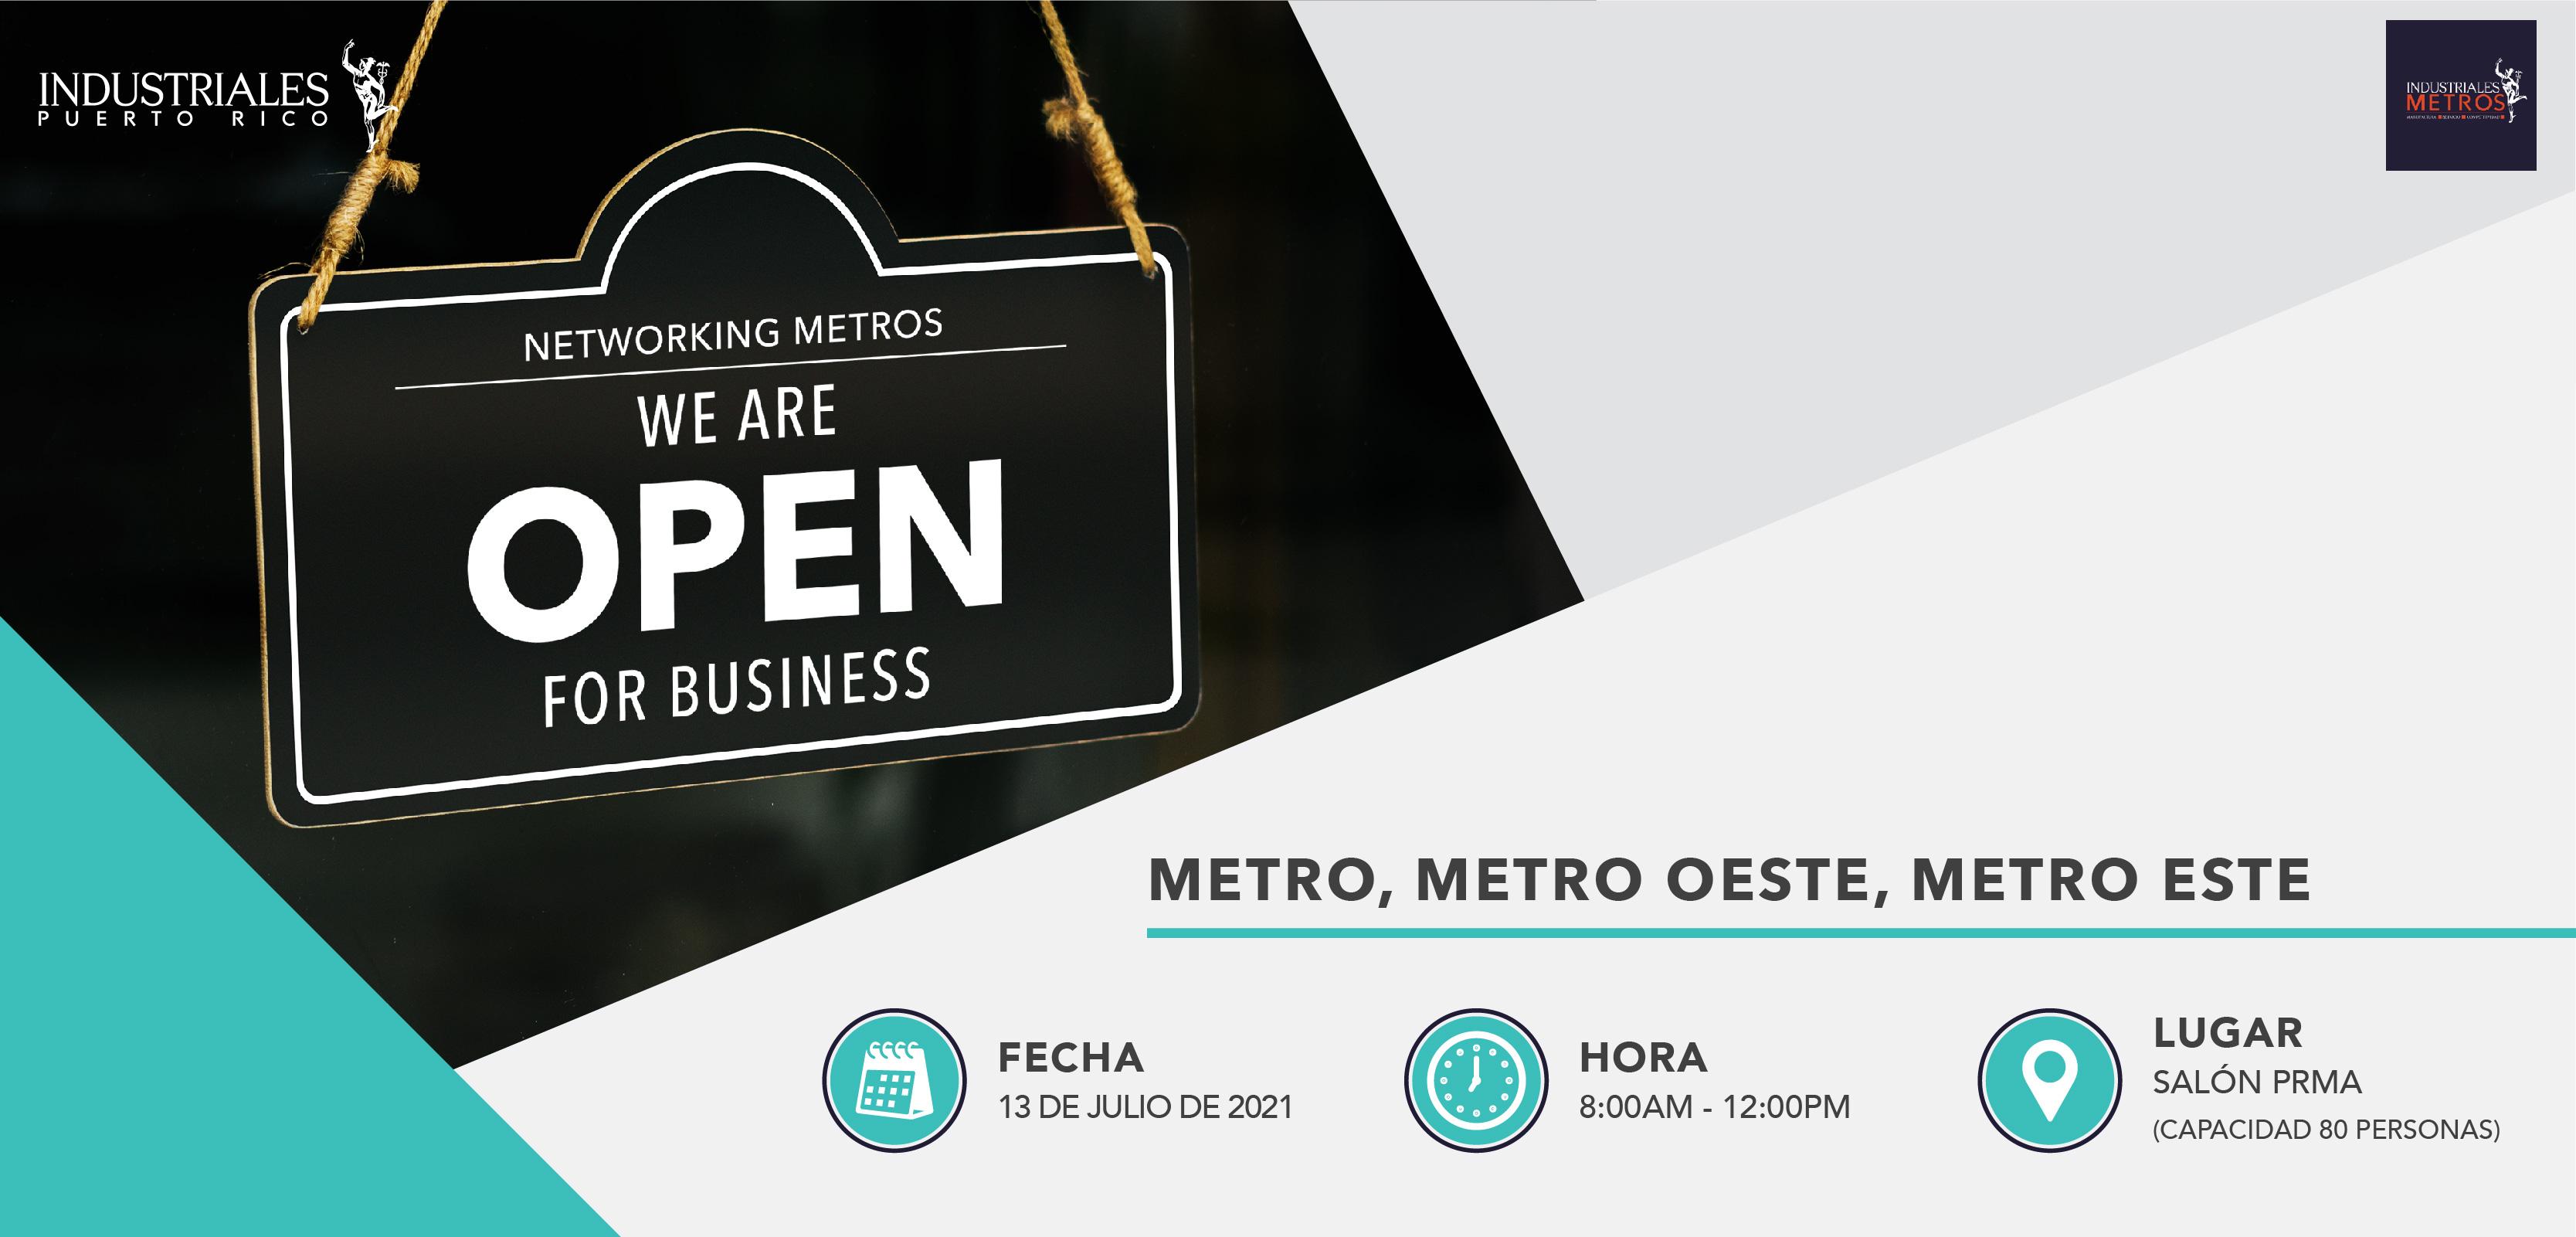 Networking Metros